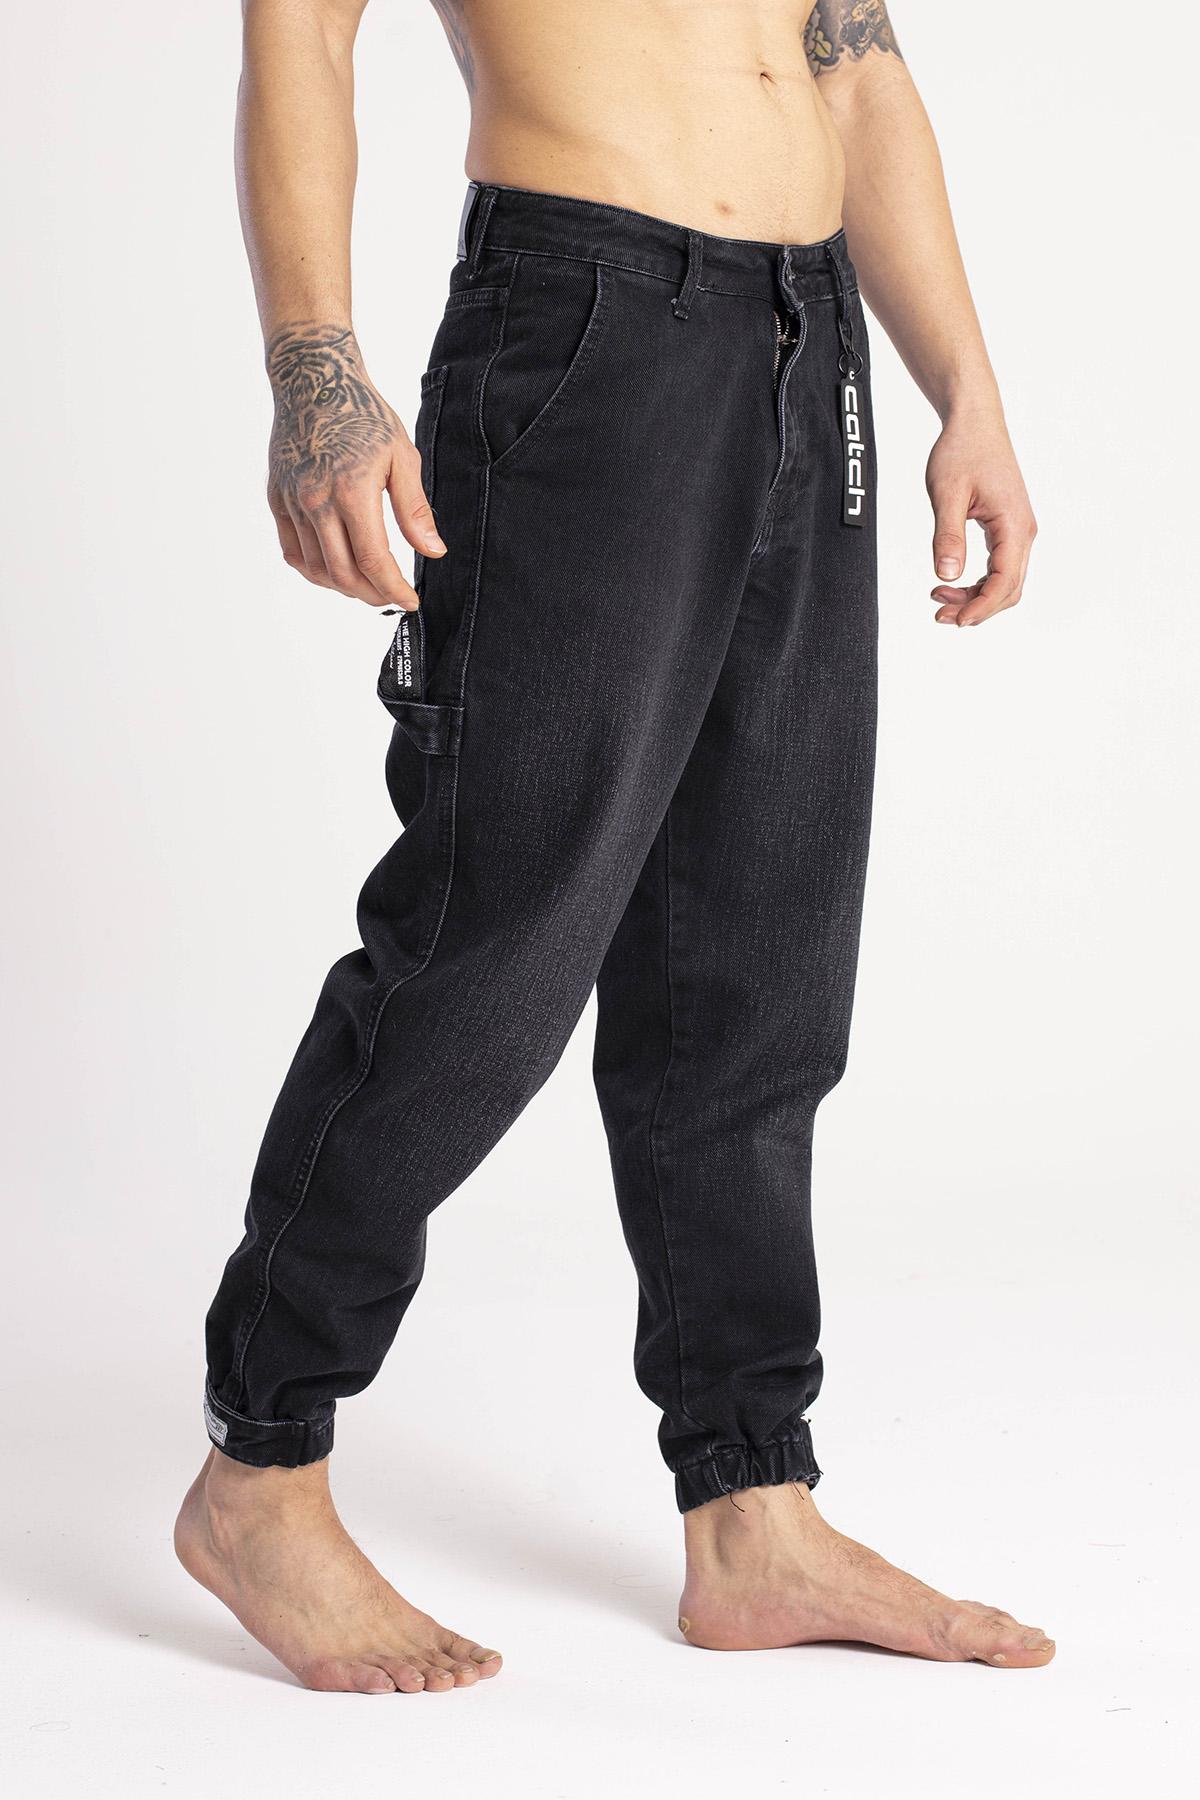 XHAN - Siyah Paçası Bantlı Jogger Kot Pantolon 1KXE5-44668-02